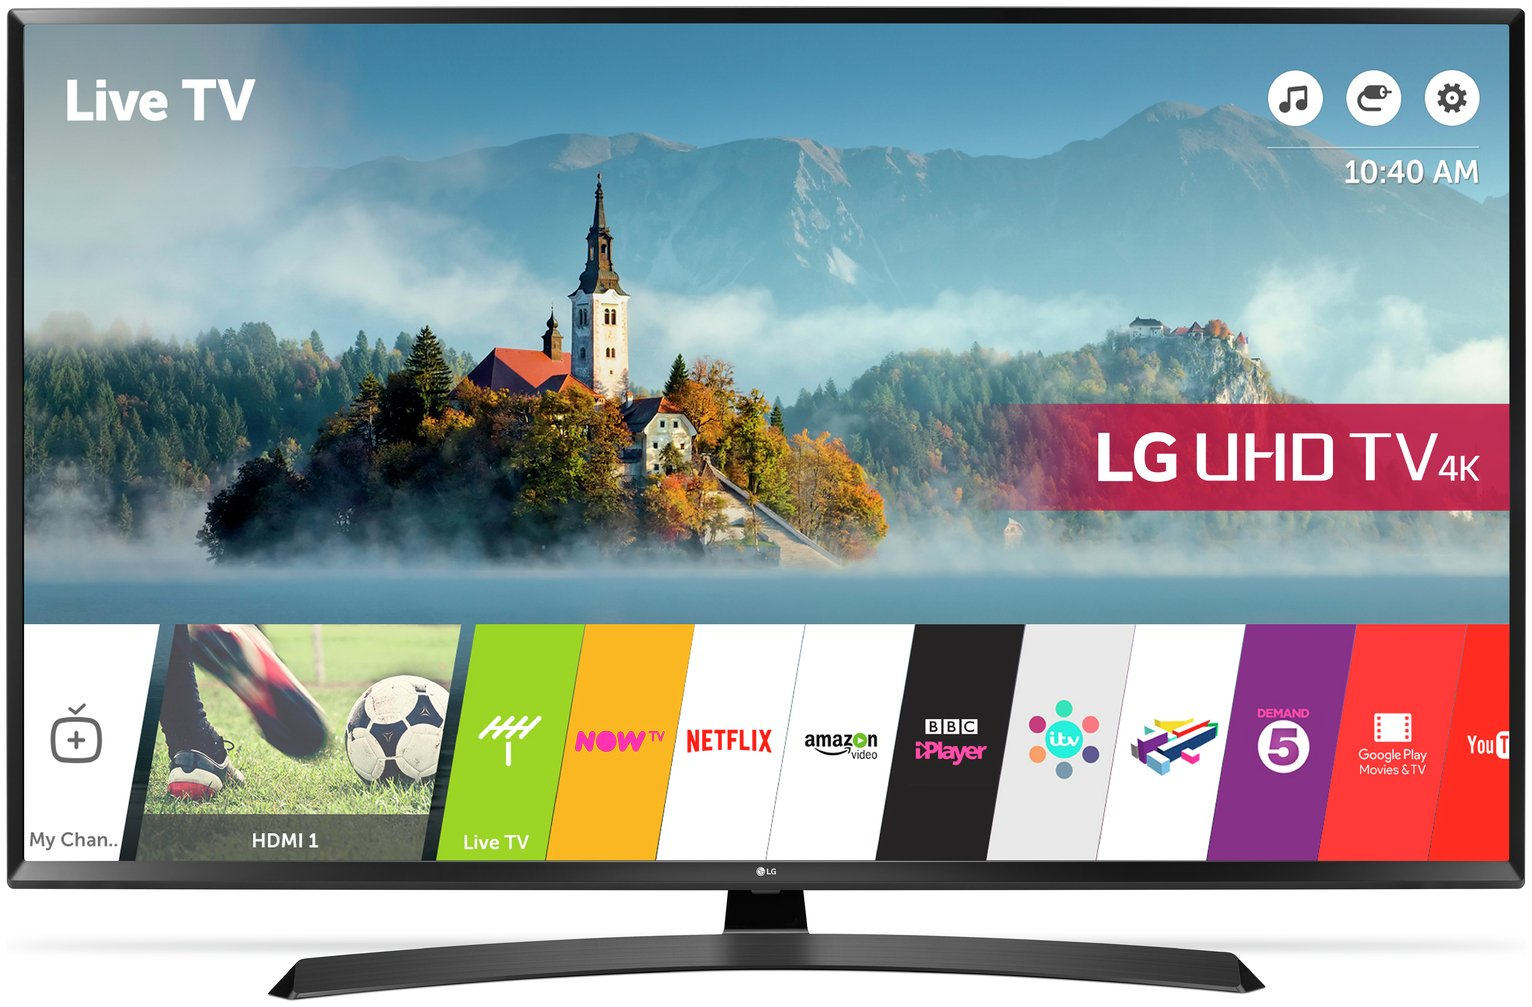 hitachi 43 inch smart tv. lg 43uj635v 43 inch smart 4k ultra hd tv with hdr hitachi tv d